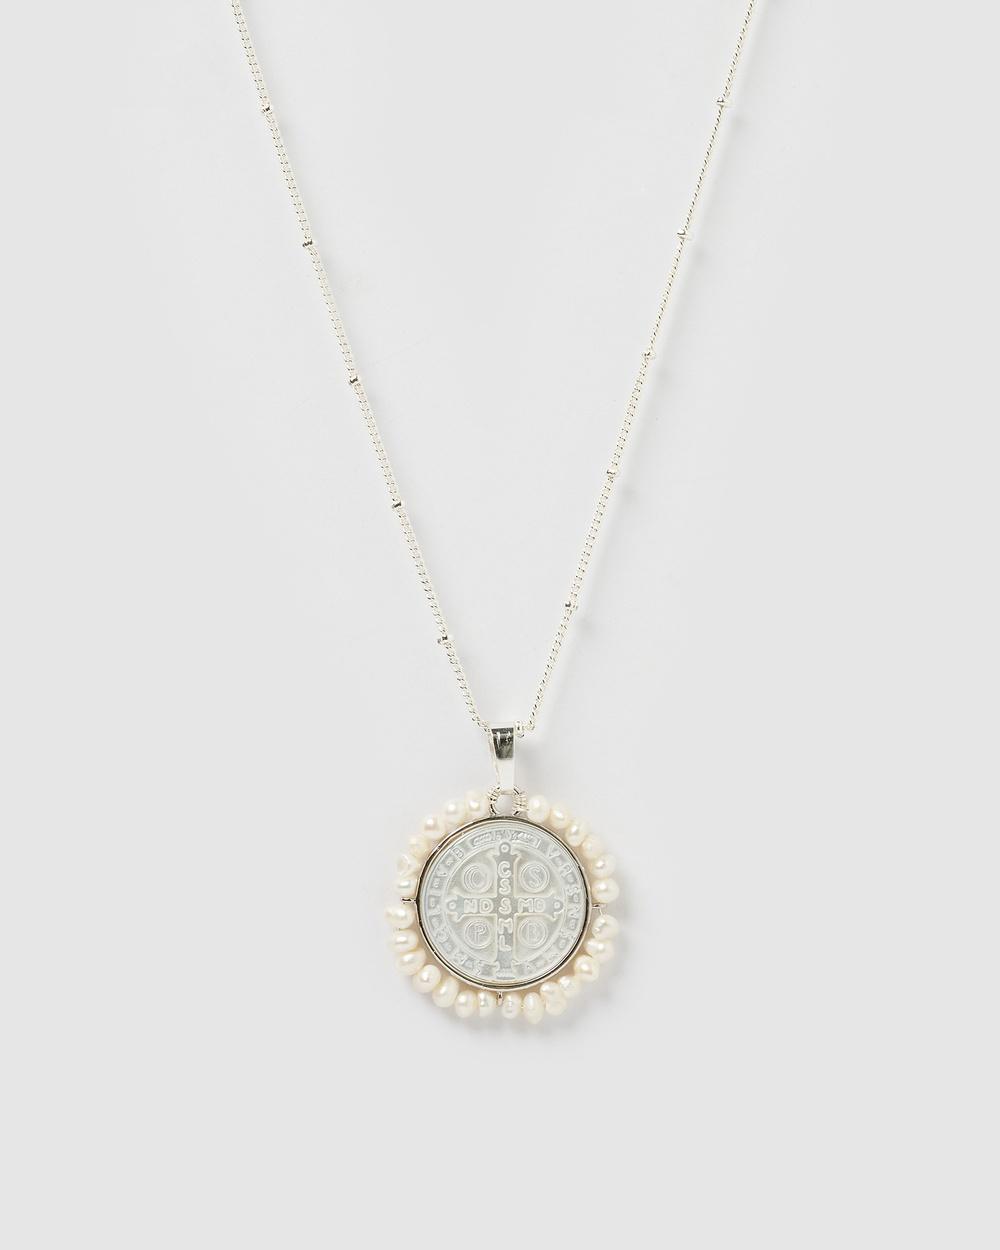 Miz Casa and Co Corinne Medallion Necklace Jewellery Silver